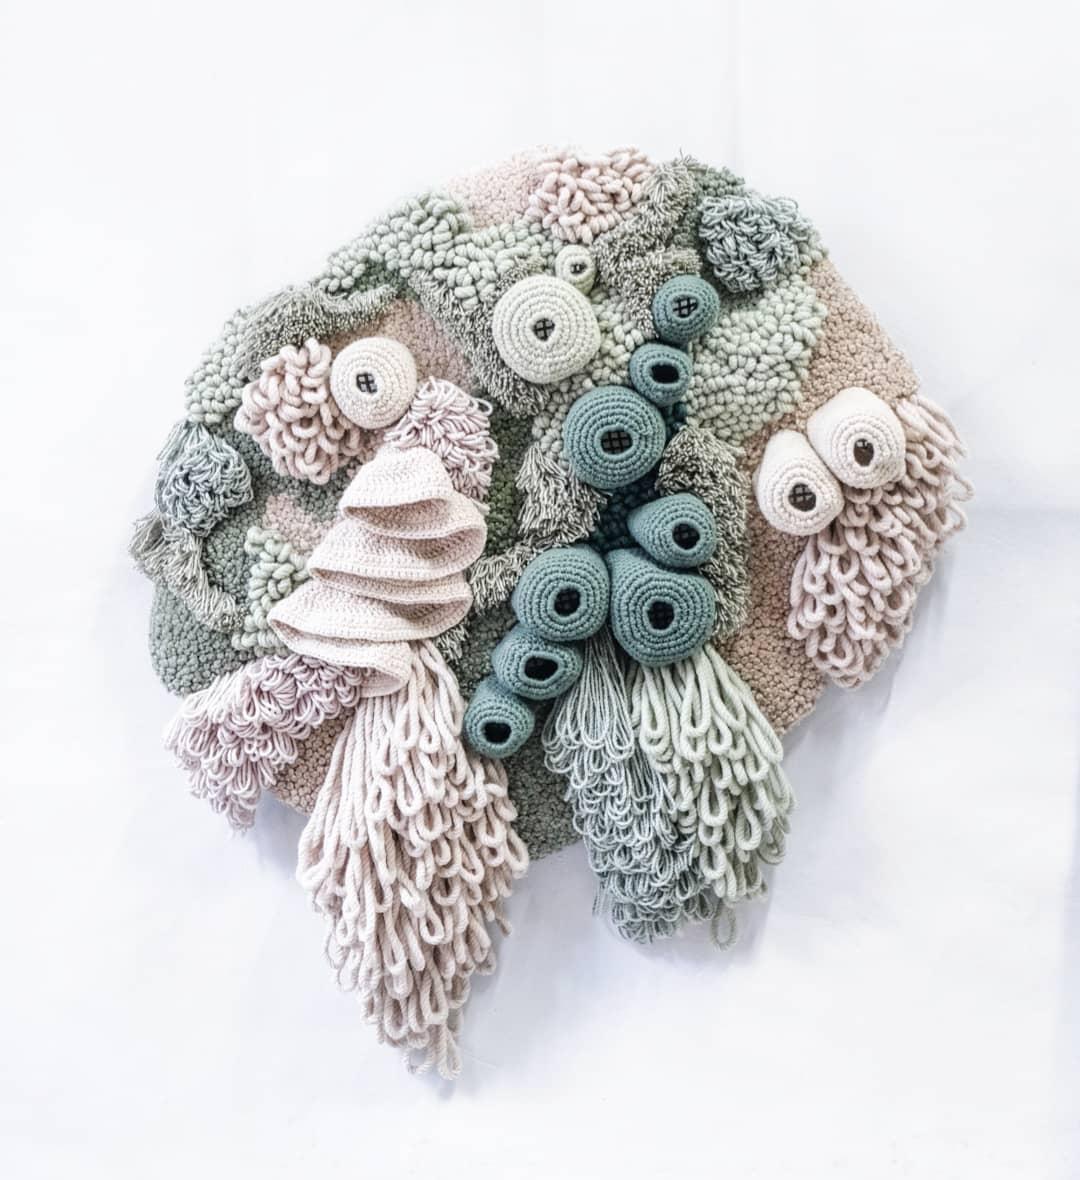 Ocean tapestry by Vanessa Barragão